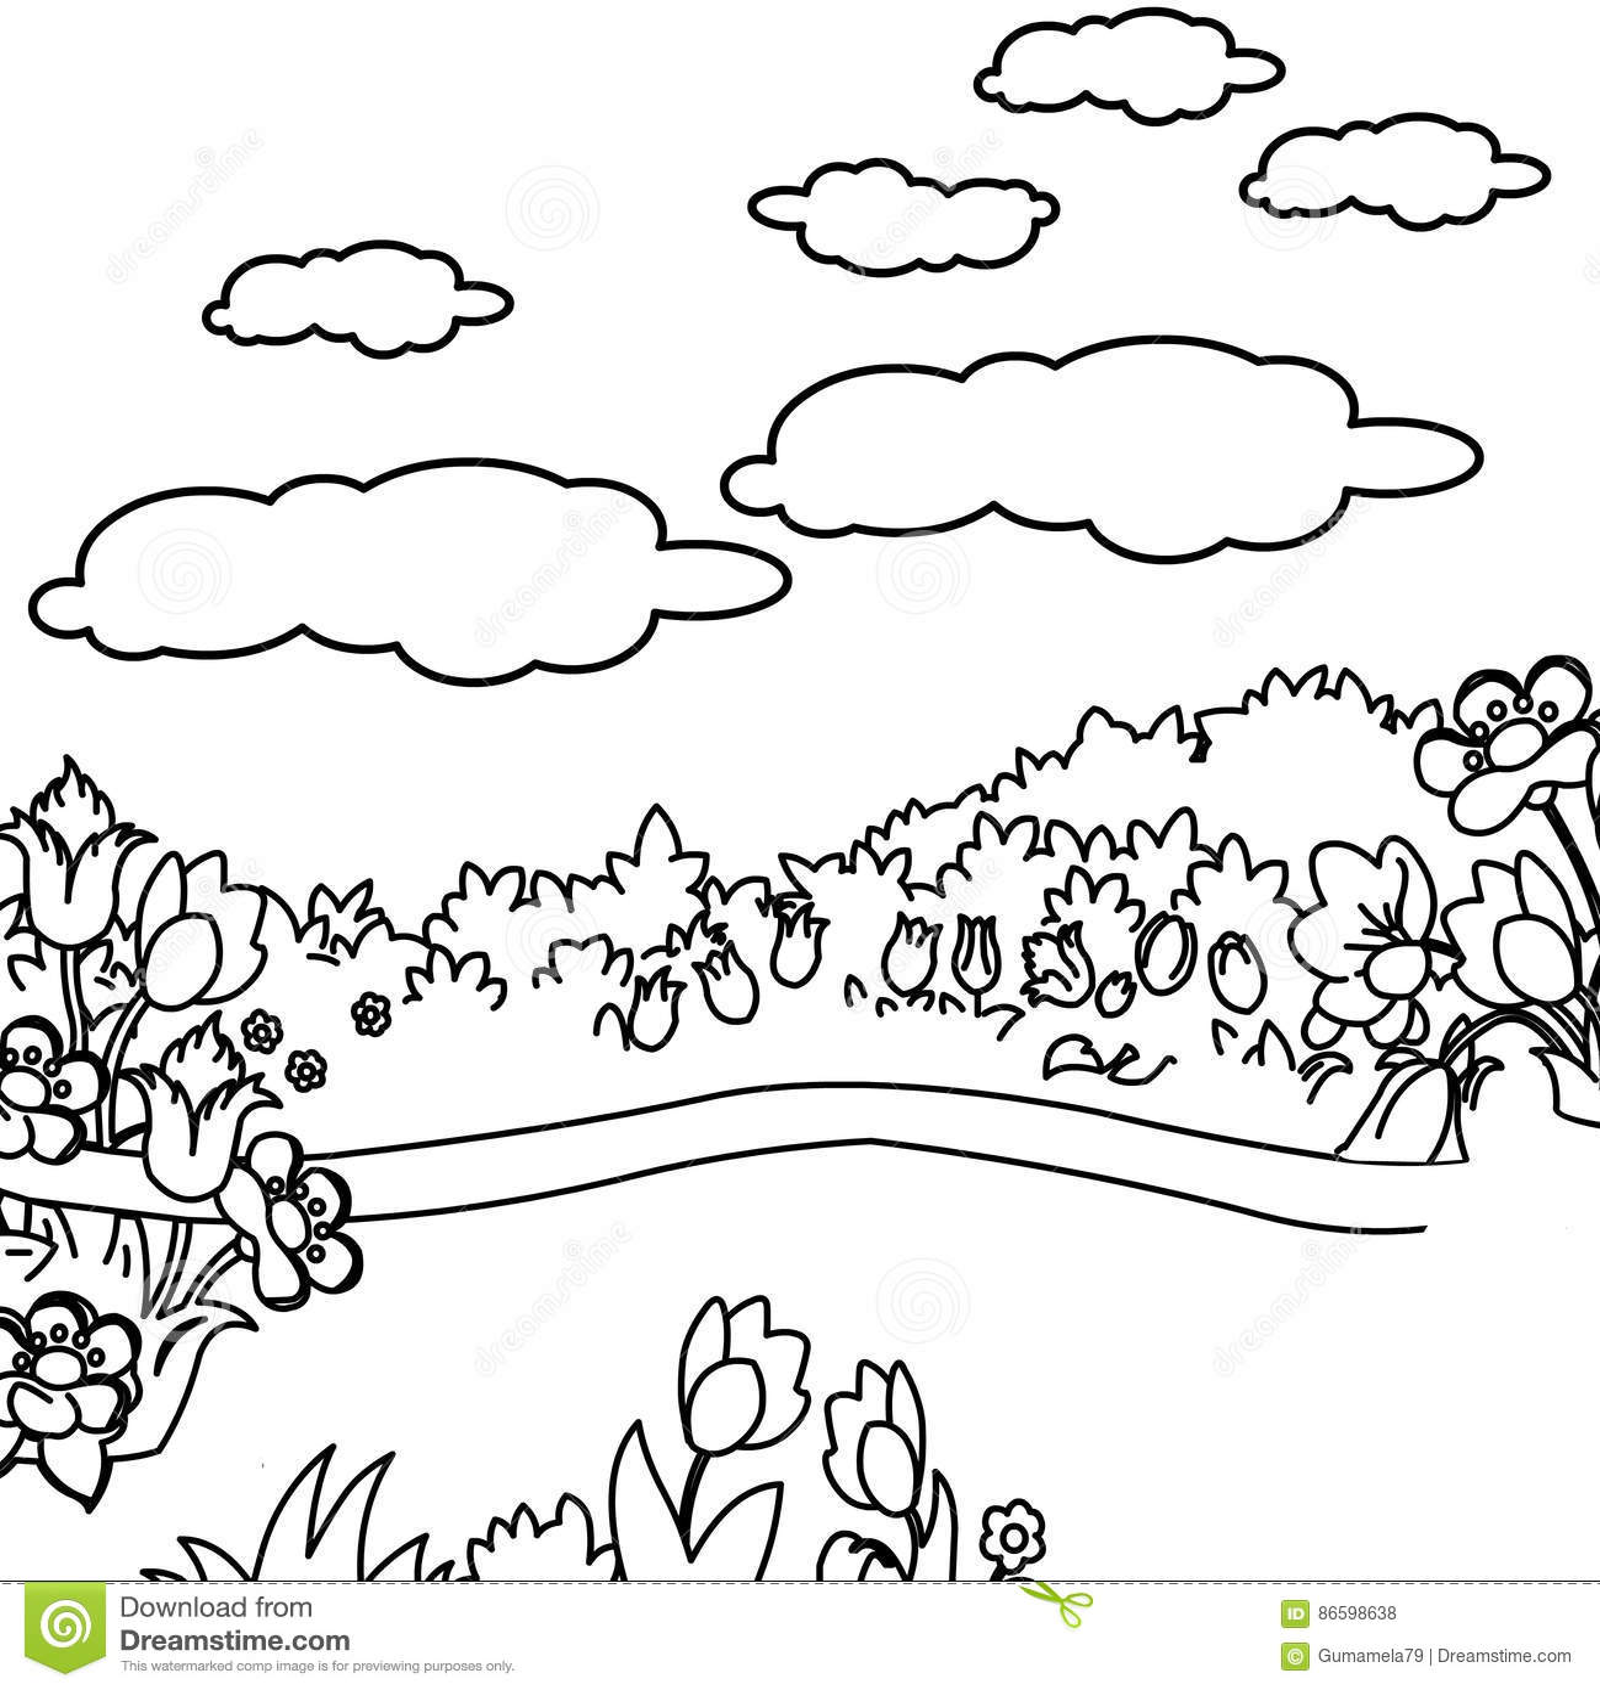 Flower Garden Coloring Page Stock Illustration - Illustration of ...